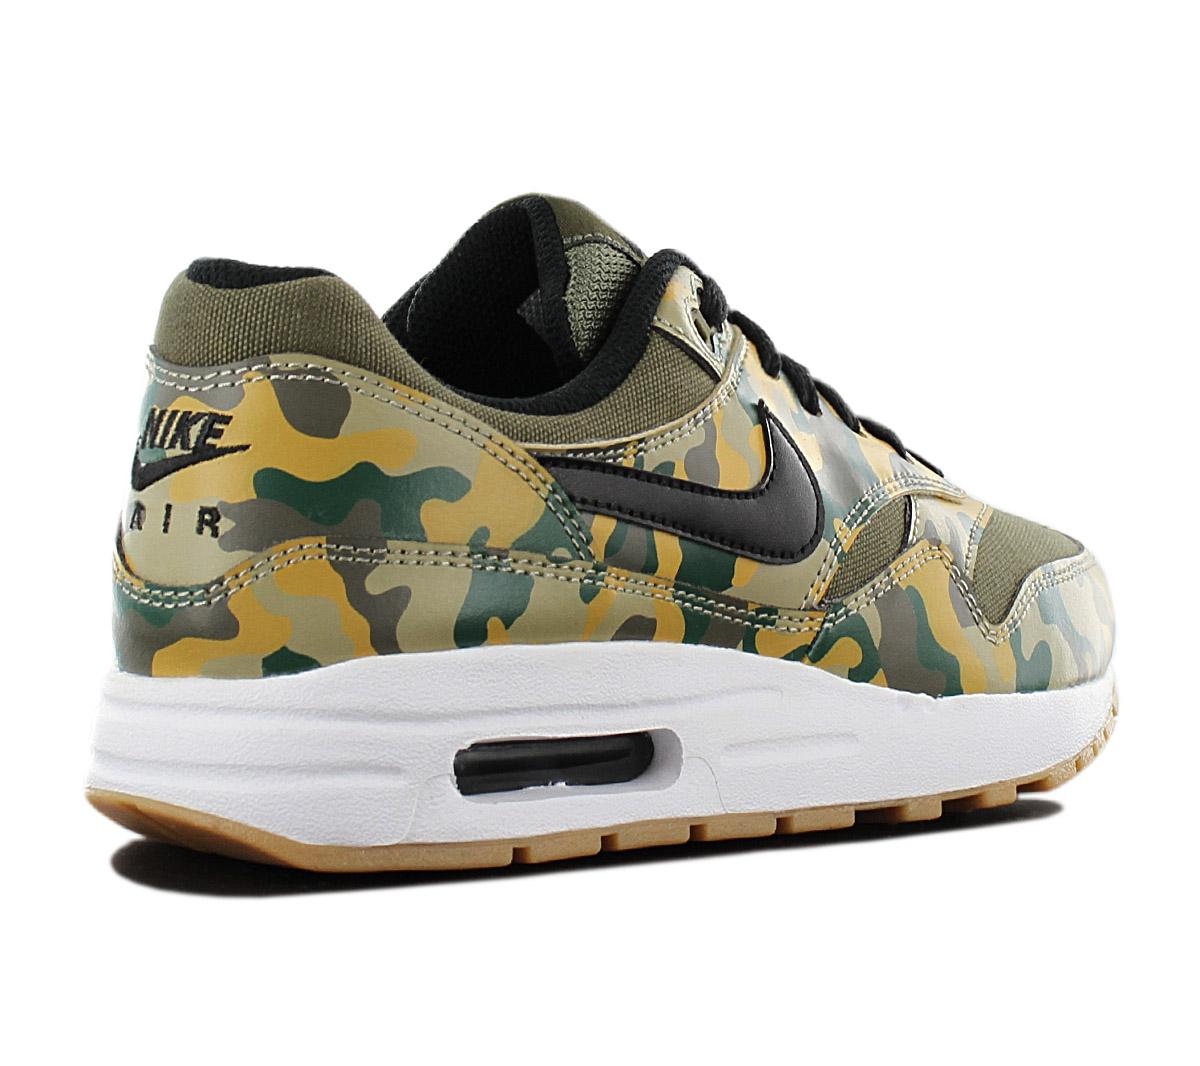 Details zu Nike Air Max 1 Print Camouflage Sneaker AR1139 200 Damen Freizeit Schuhe NEU